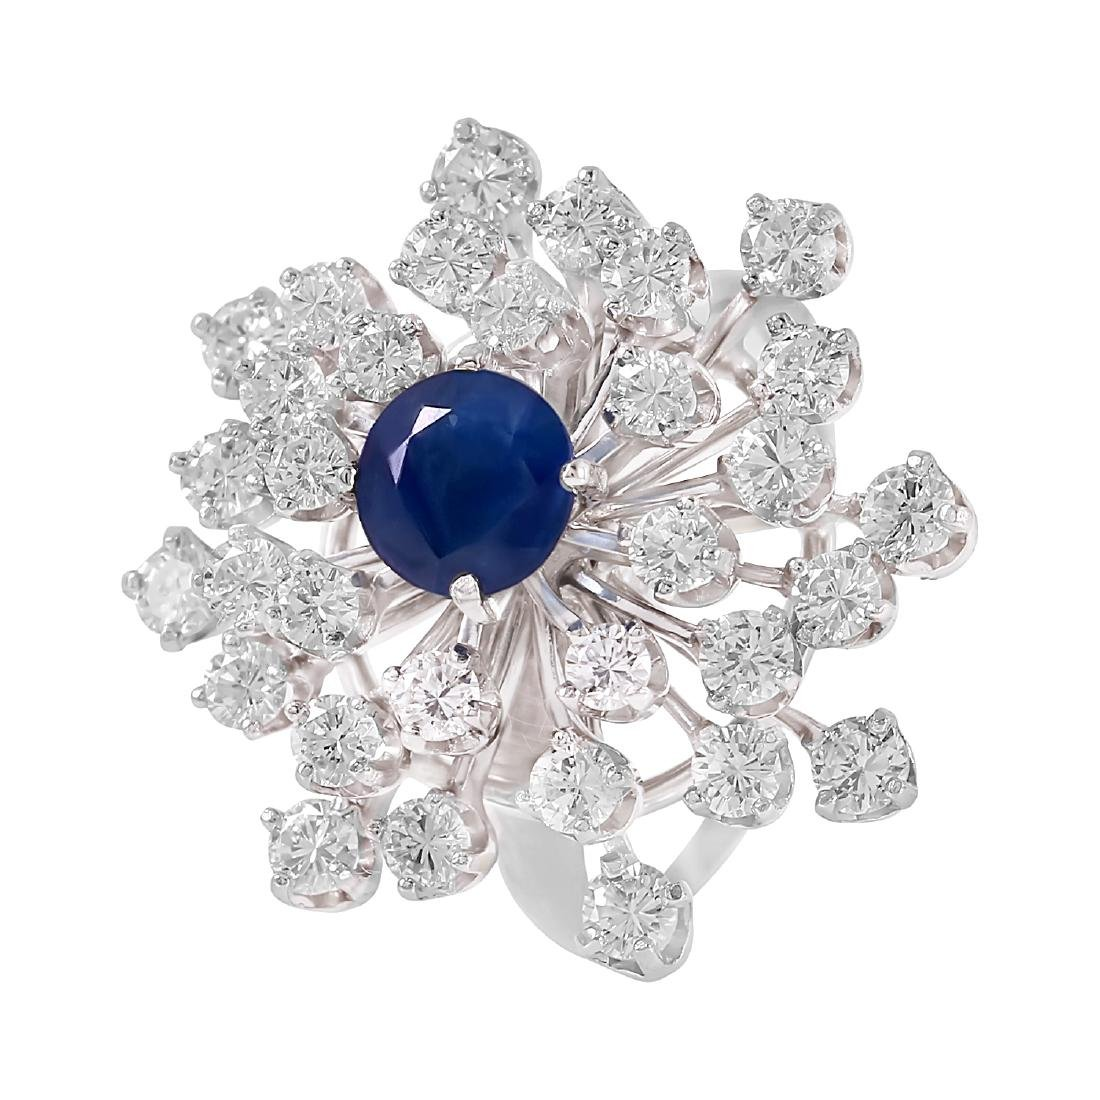 14KT White Gold 2.54ctw Sapphire Diamond Cocktail Ring